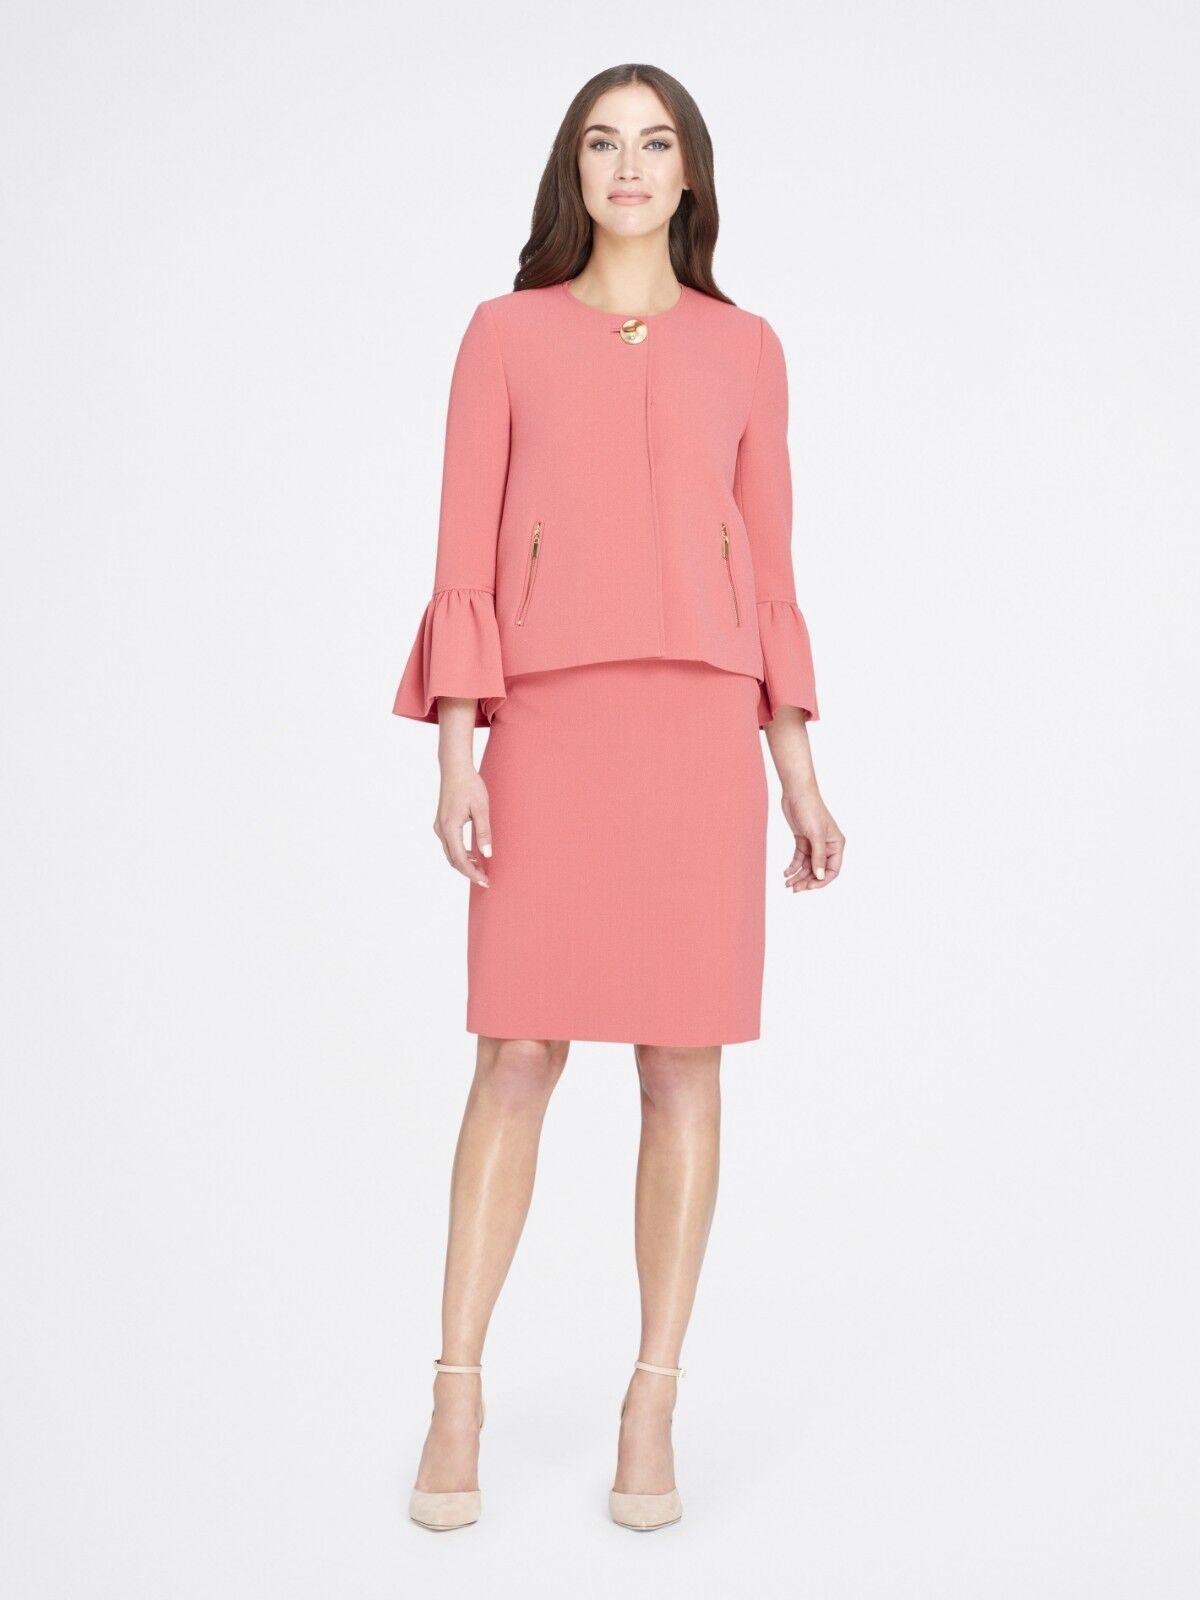 Tahari Trumpet-Sleeve Crepe Skirt Suit Coral Reef Petite Size 8P   280